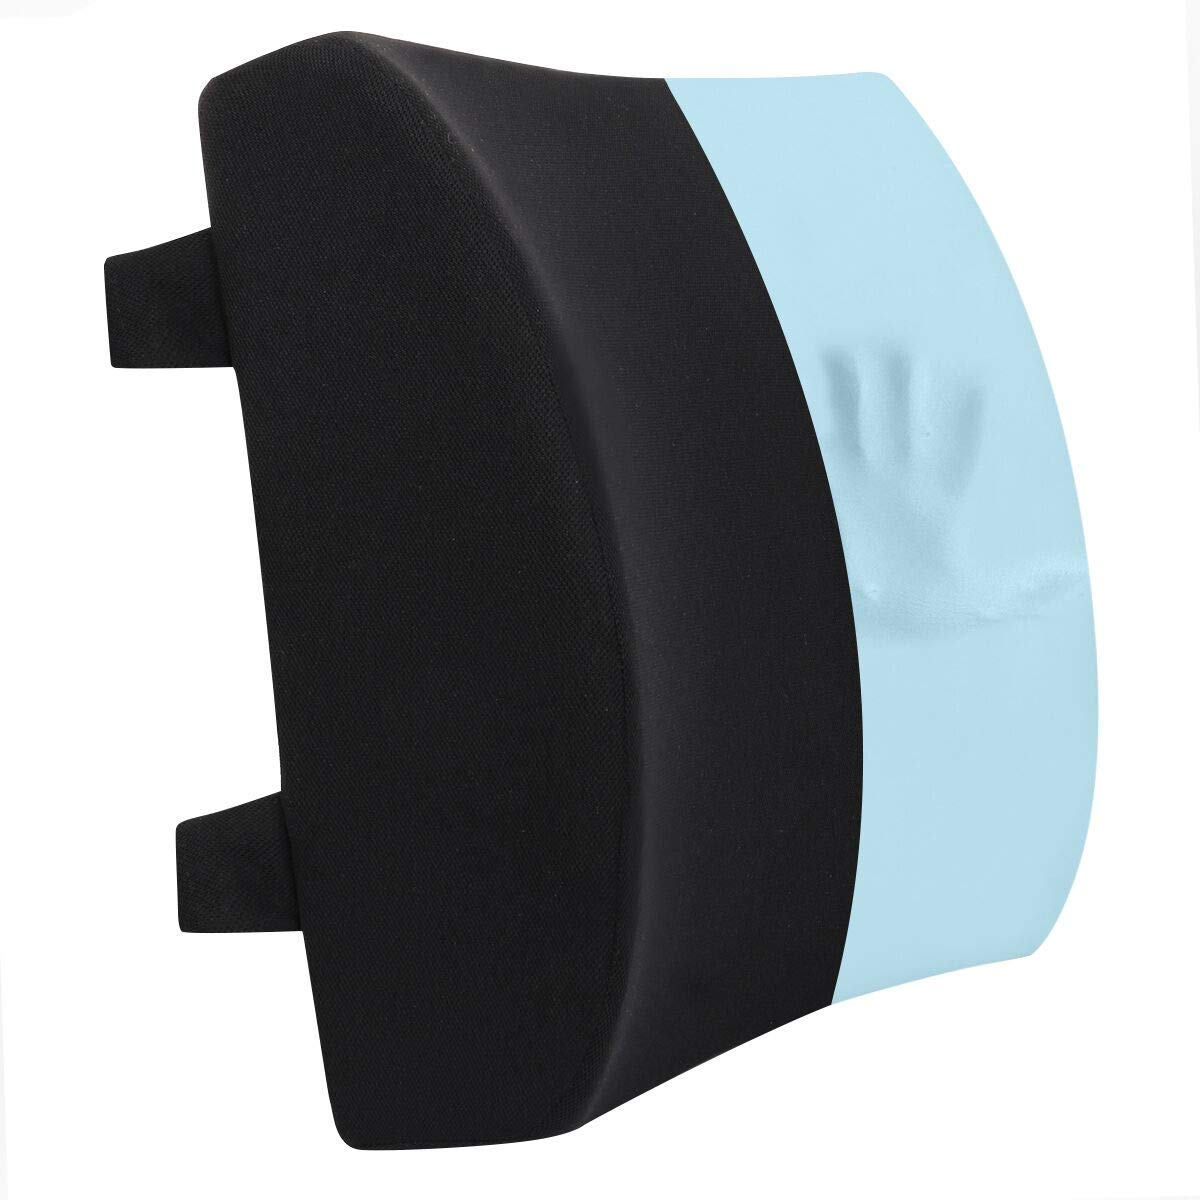 Wishcush Lumbar Support Pillow, Memory Foam Back Cushion for Car Office Computer Chair, Ergonomic Back Support Pillow for Back Pain Relief (Black)